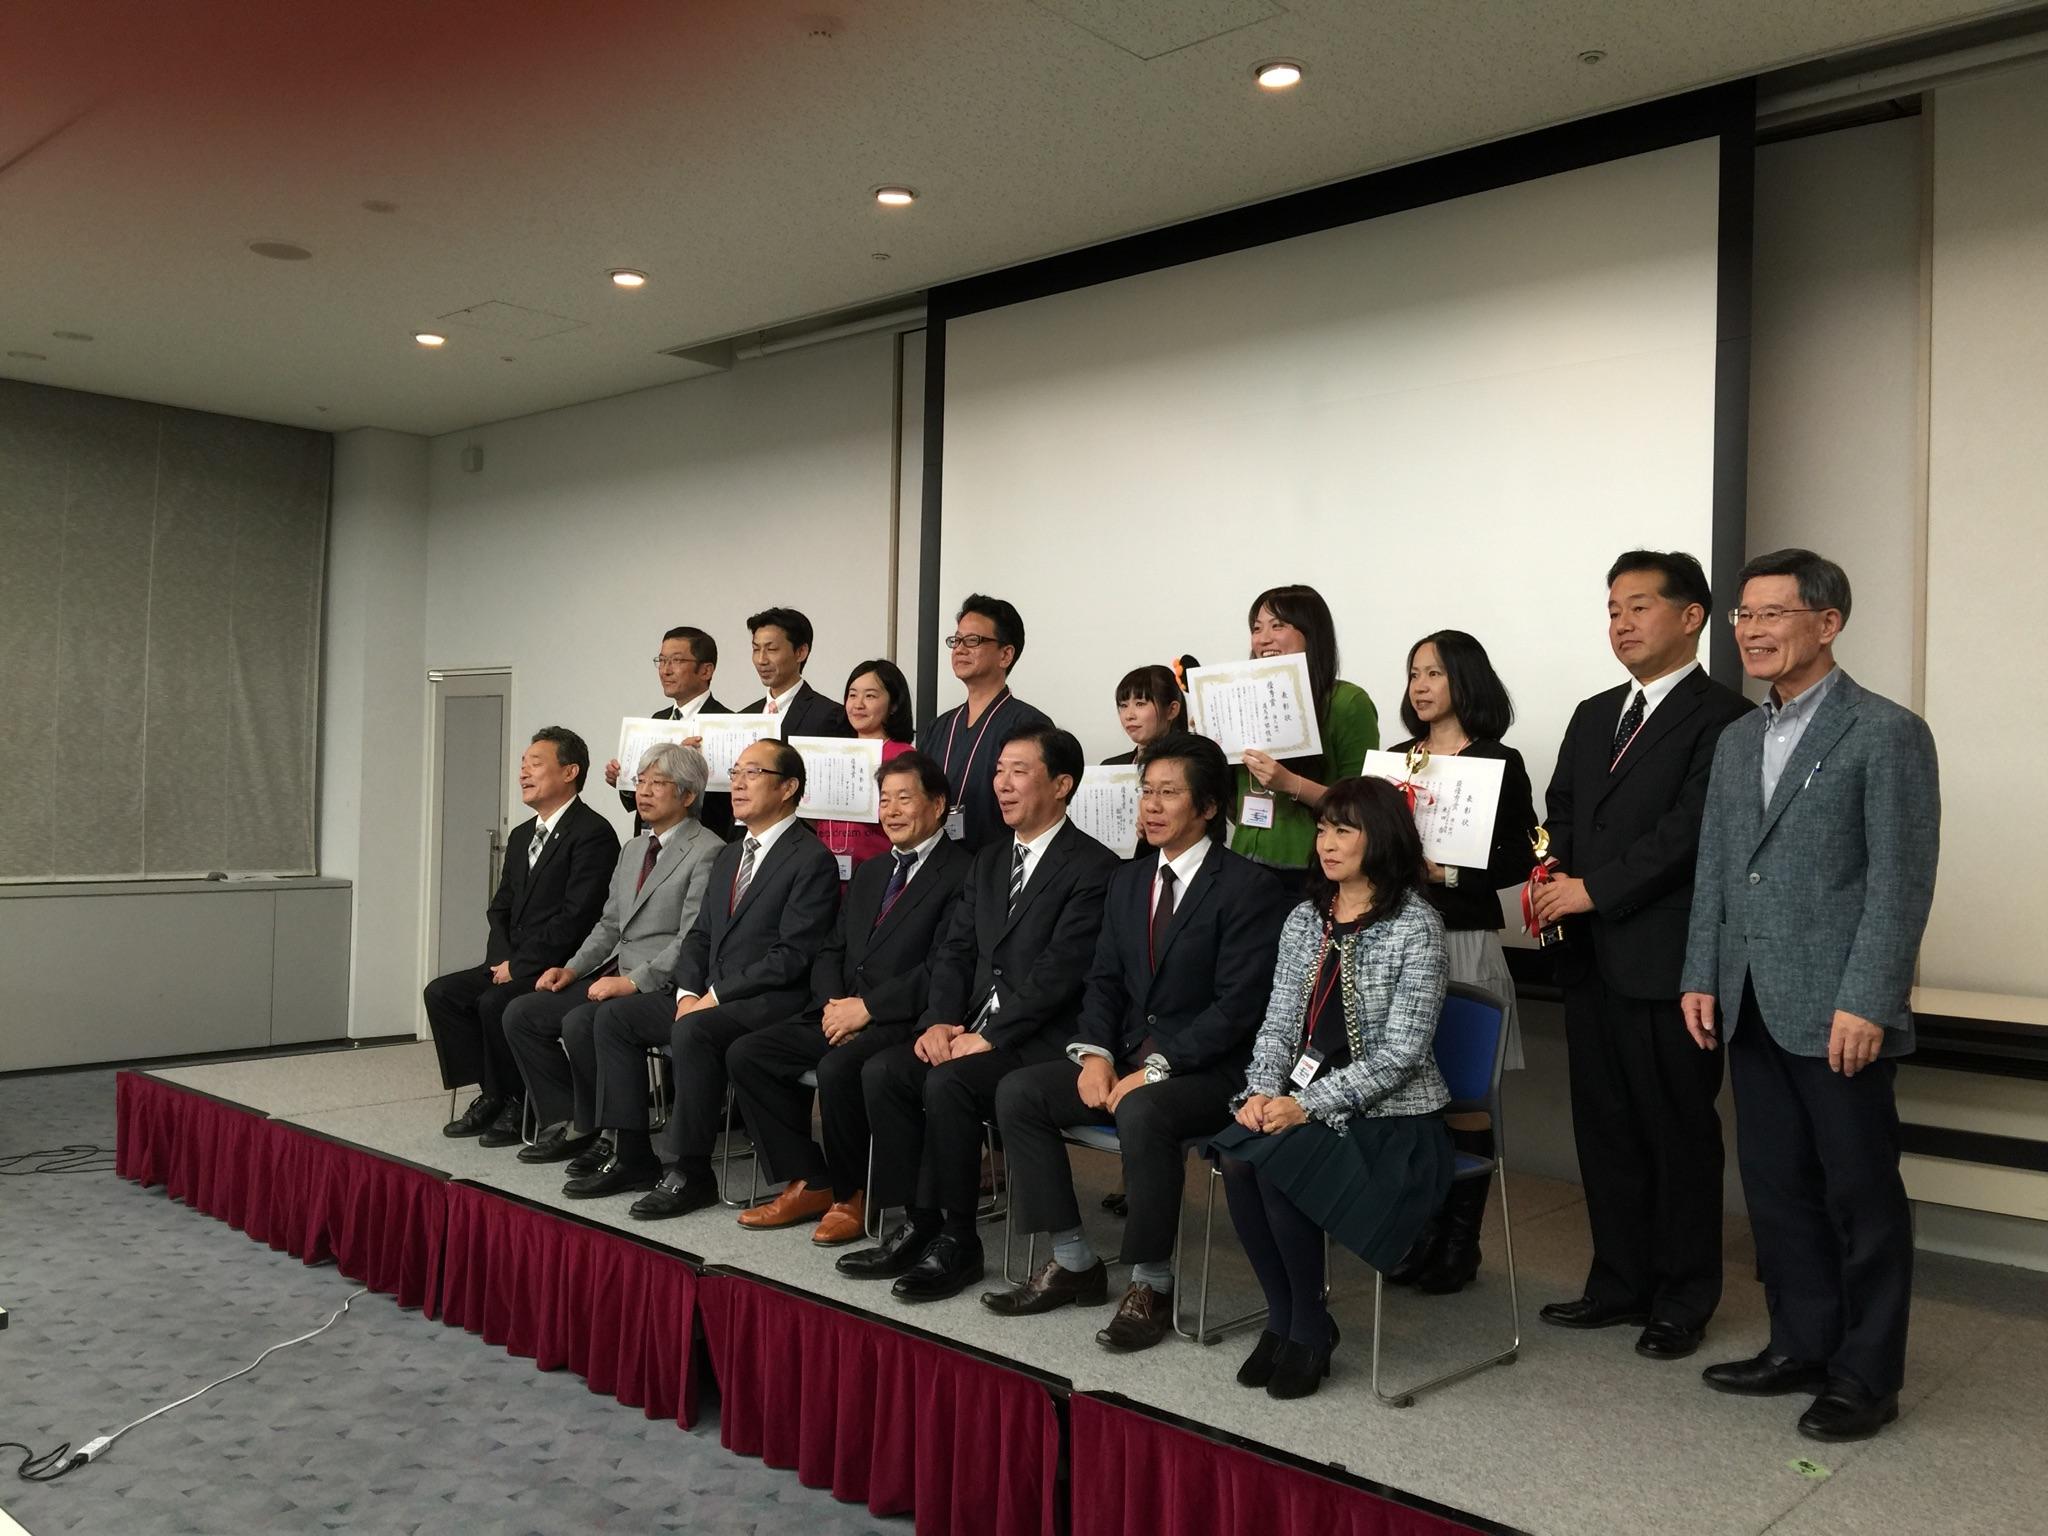 20141020-IMG_ceremony.jpg